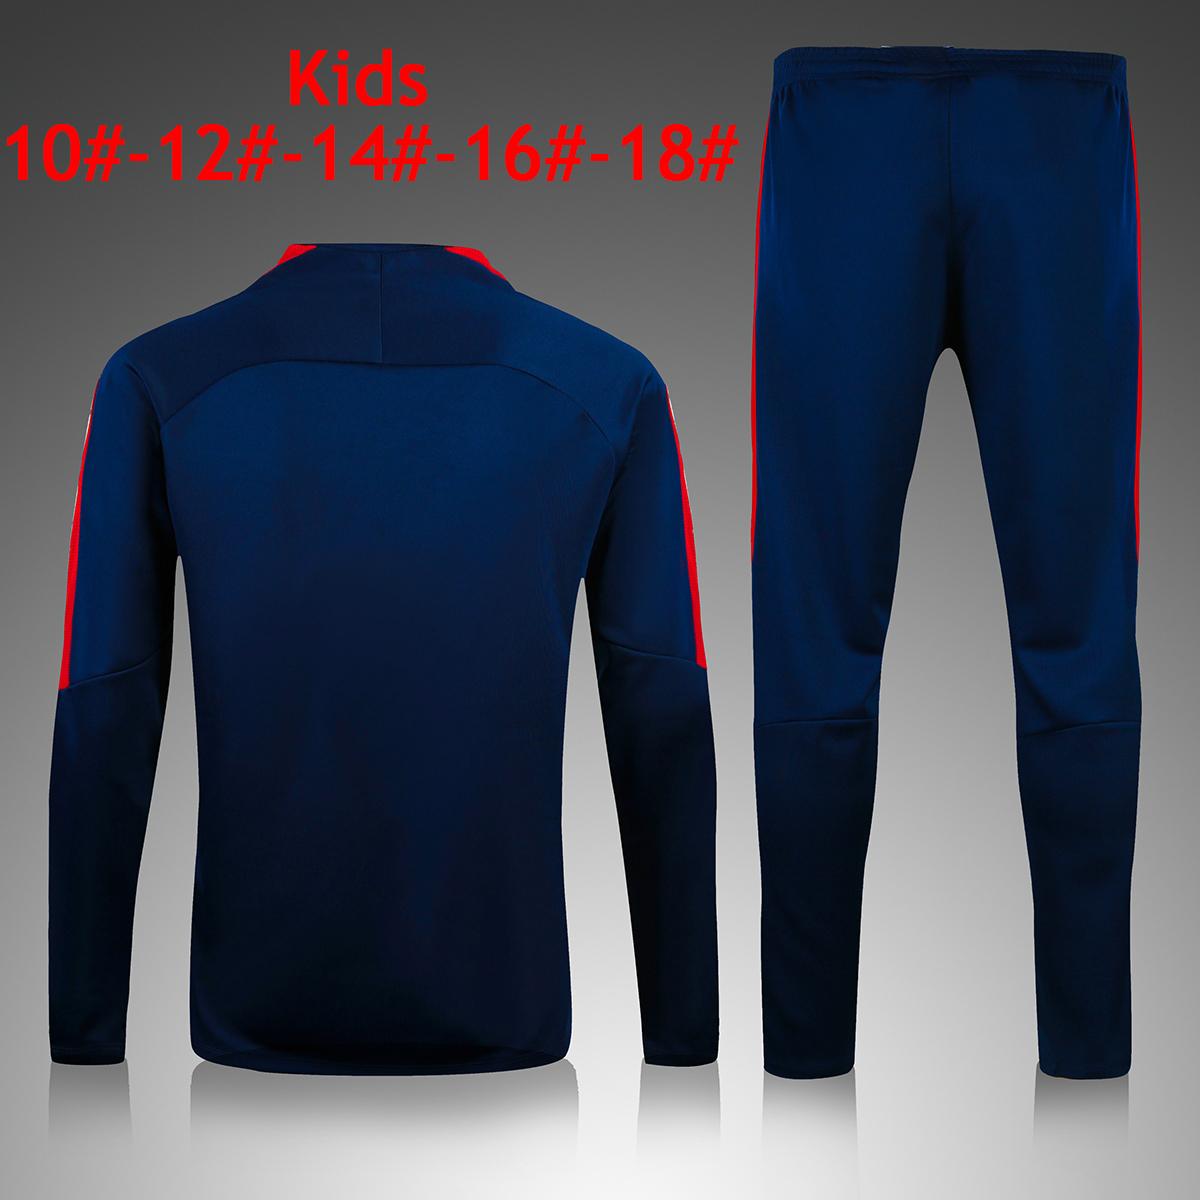 95591c2cf PSG Kids Chidlren Football Jerseys BLUE Training Kits Soccer ...